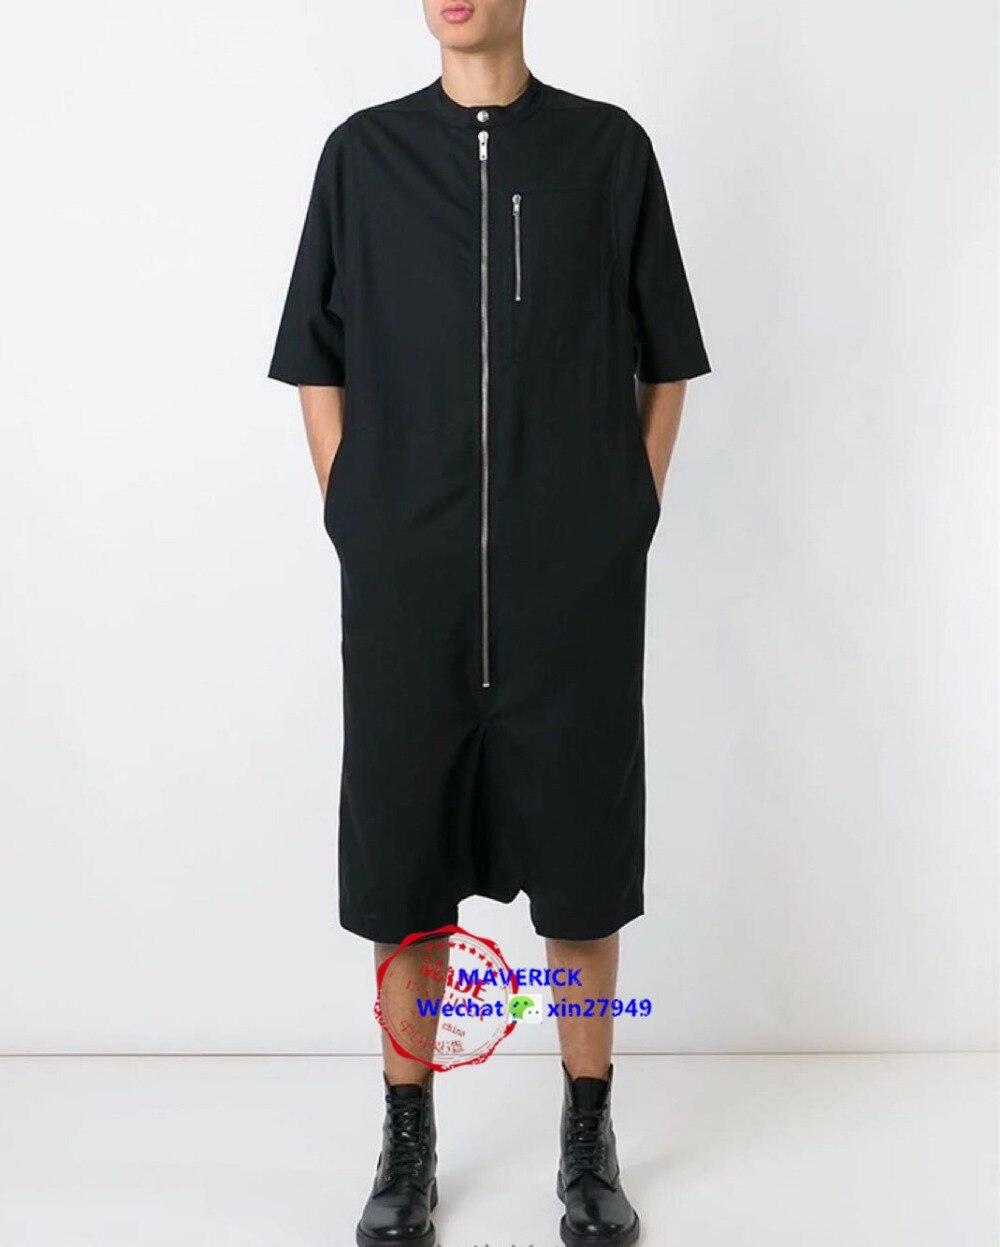 42 Mono Entrepierna Cremallera Verano Estilo Estilista Pantalones De Manga Corta Bajo 27 Moda 2017 Siameses Hombres Europeo qdwAW7Bp